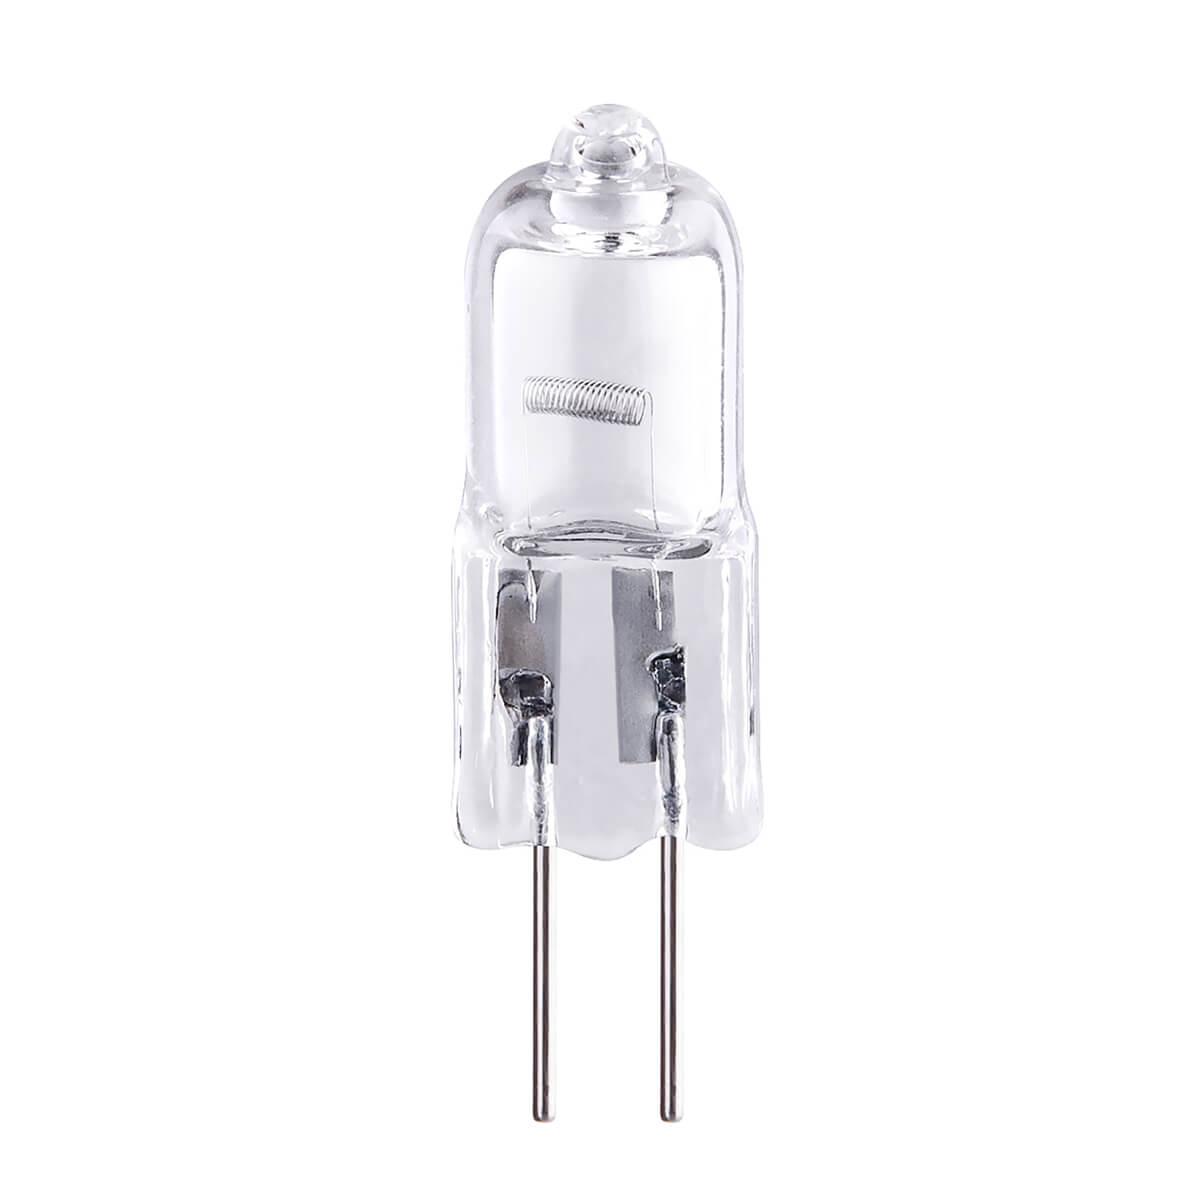 Лампочка Elektrostandard 4690389013621 Гало